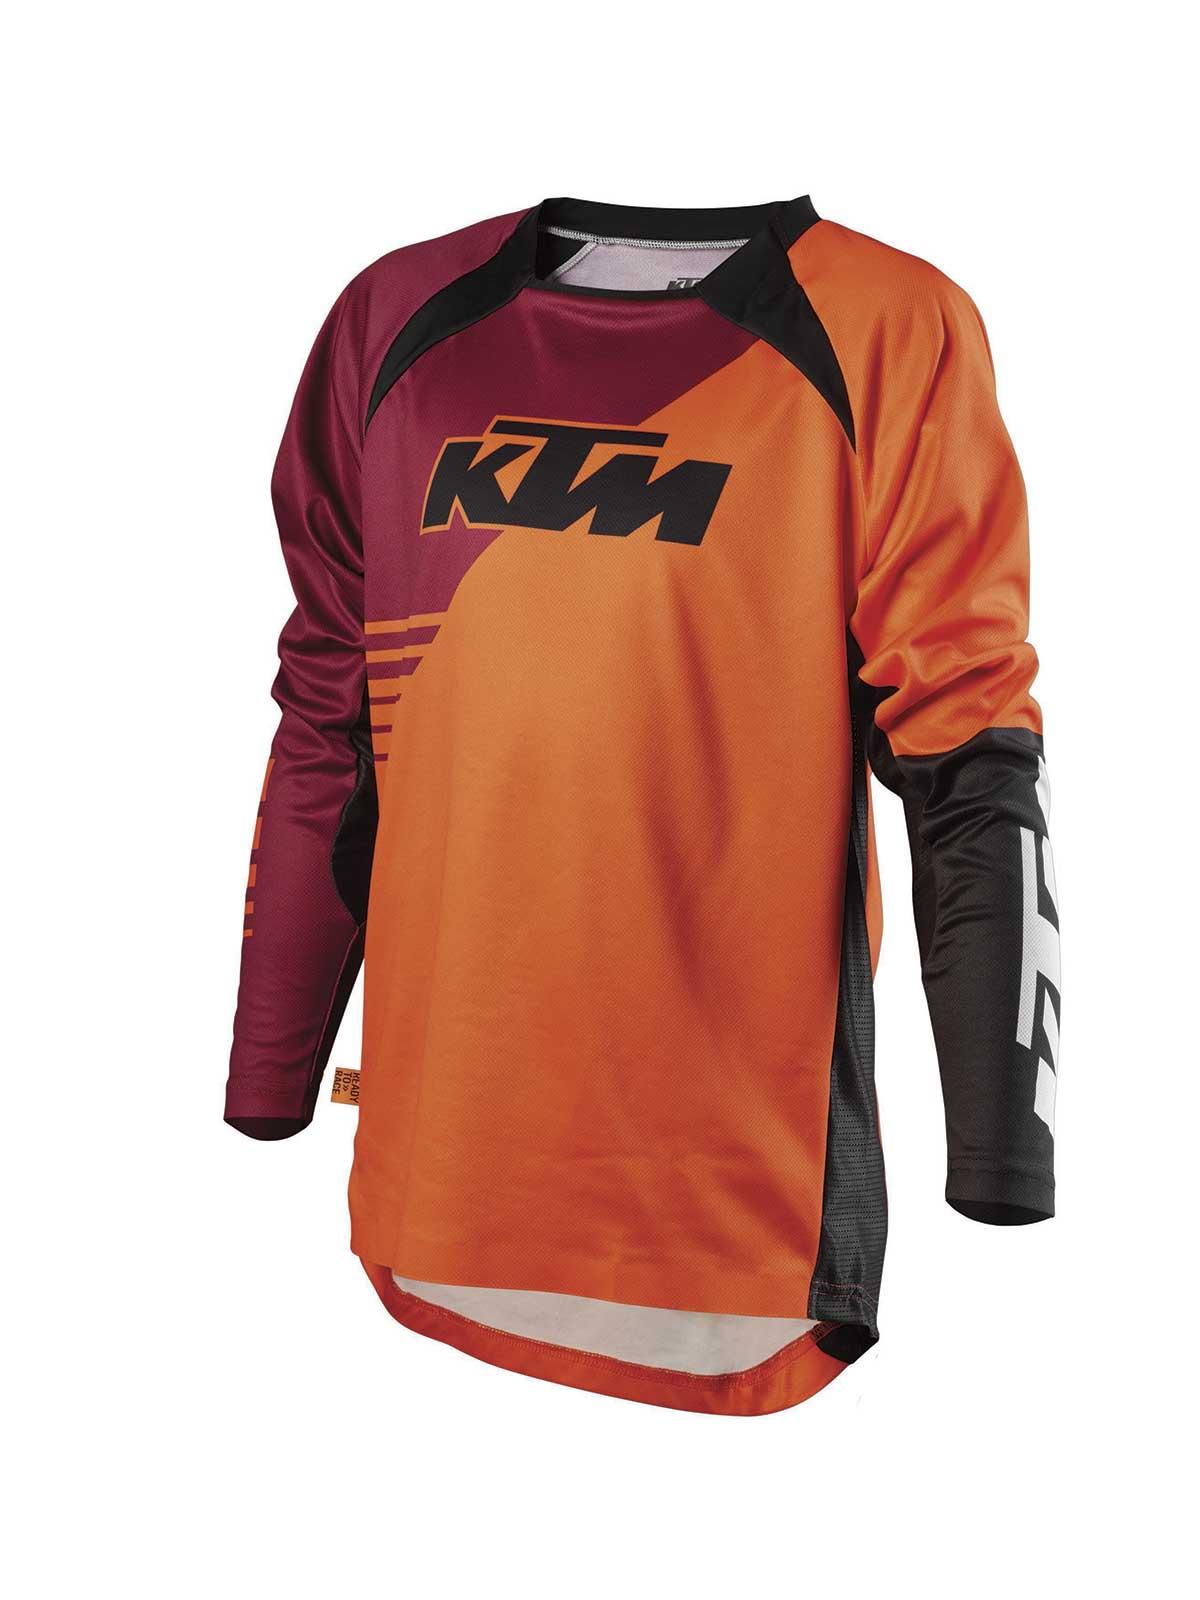 on sale a5906 0b20b Enduro Action - KTM nuova collezione Powerwear Offroad 2020